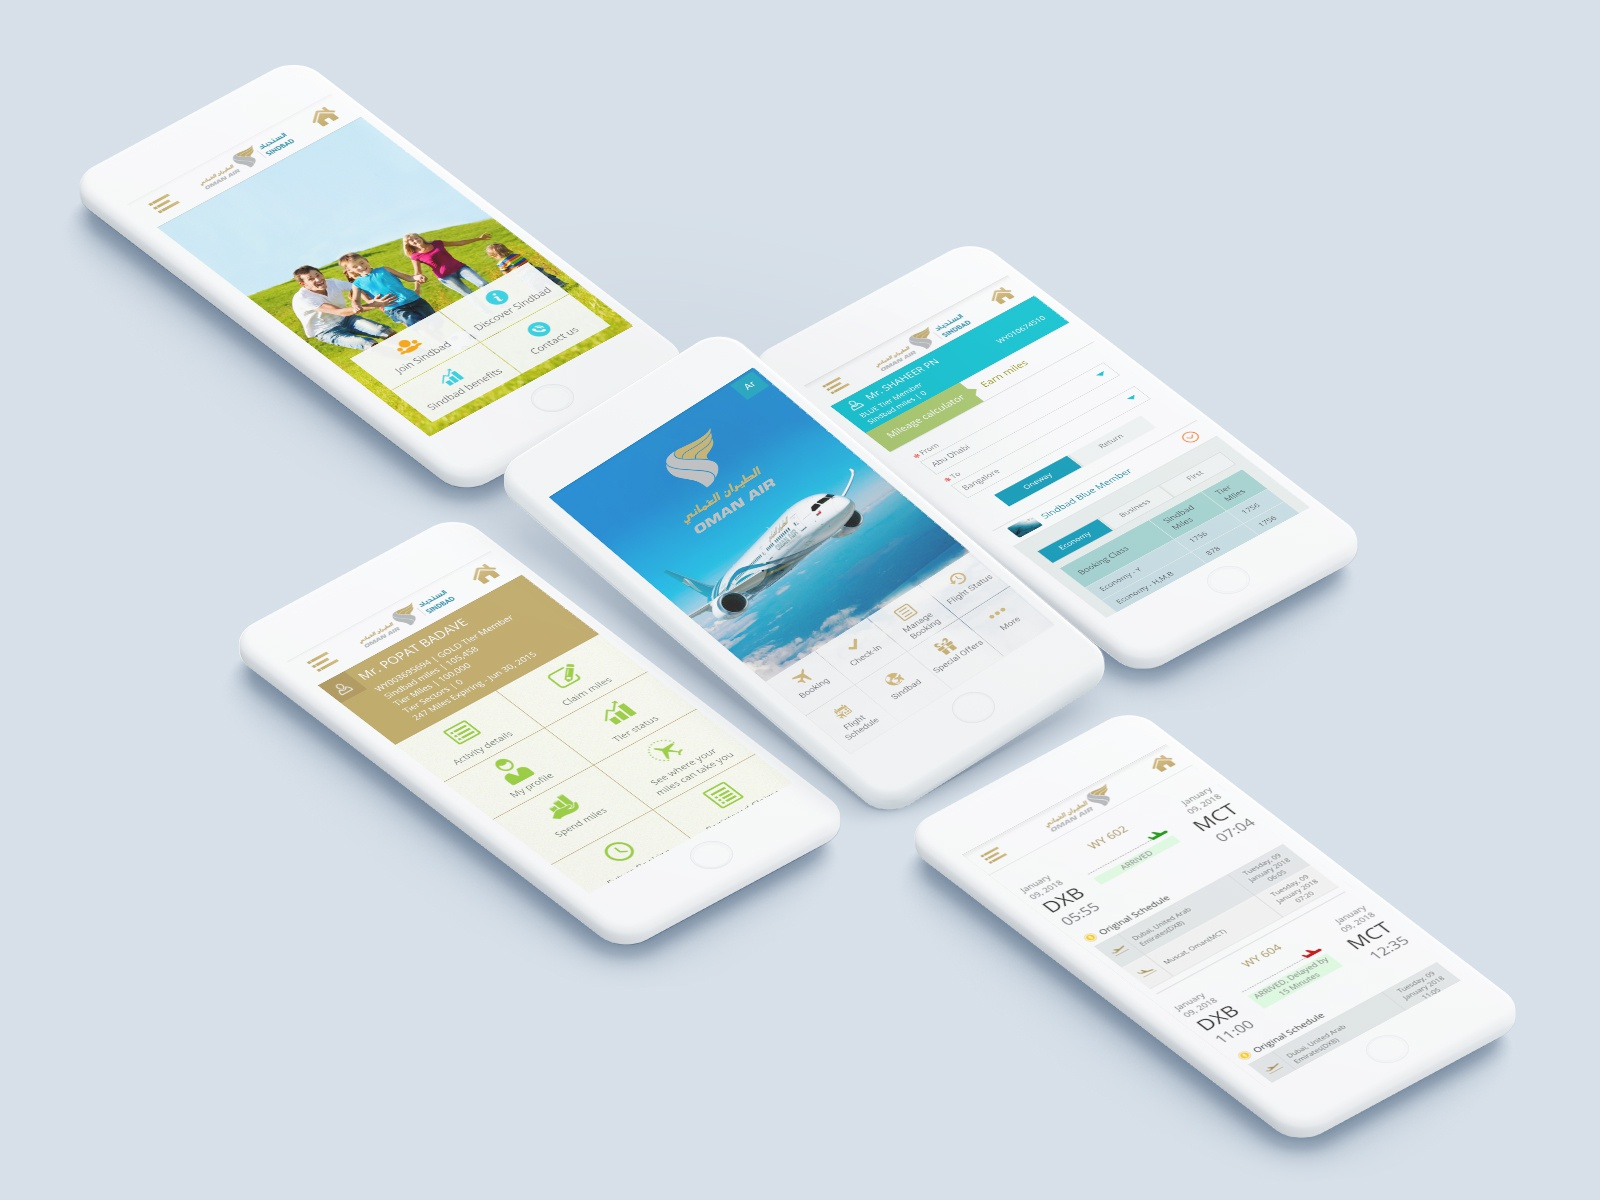 Omanair app